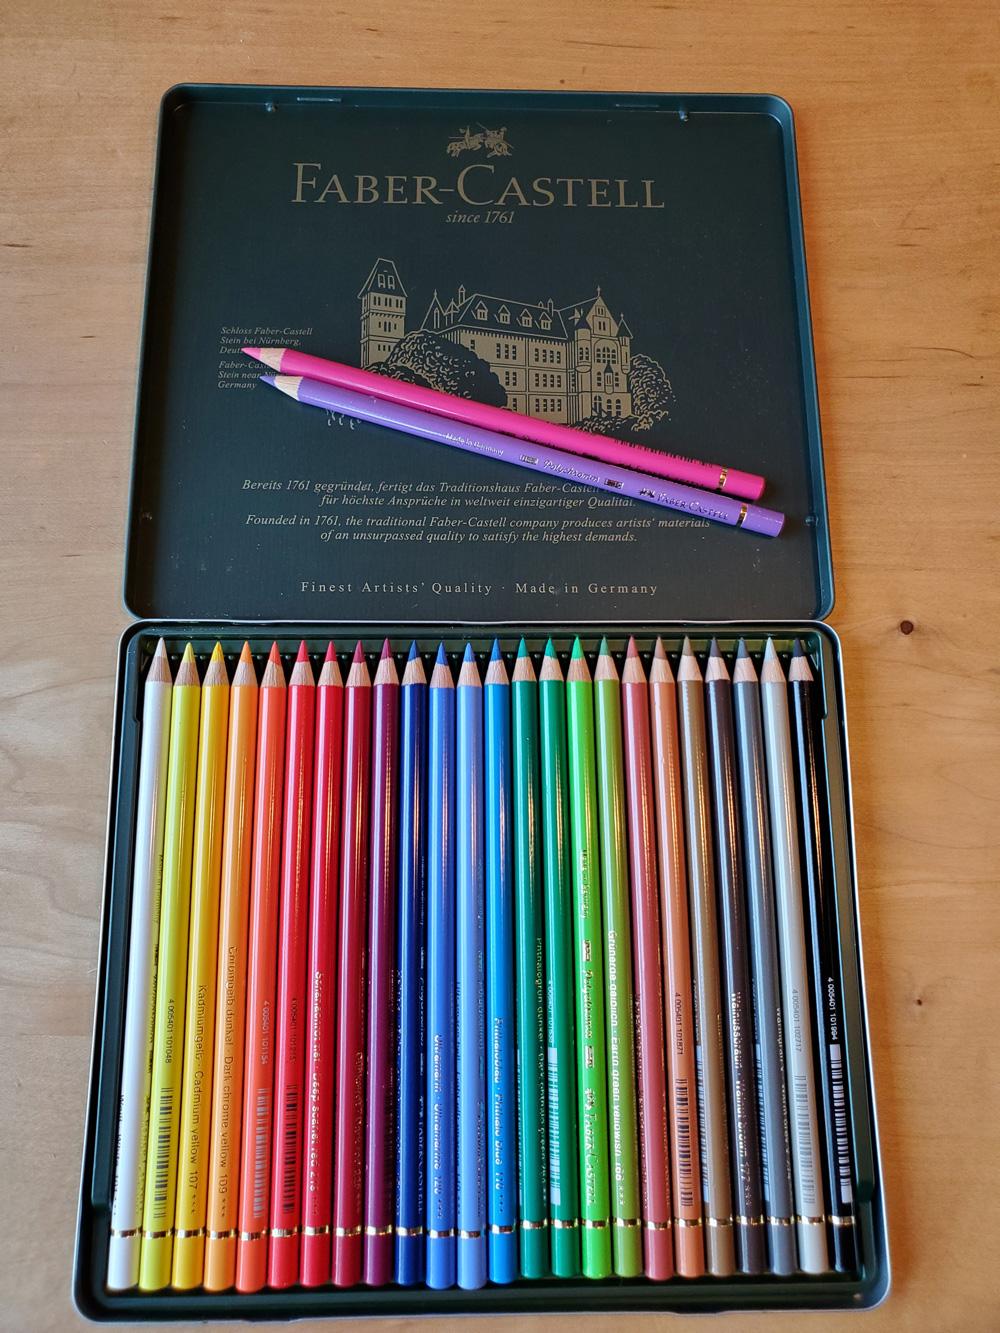 Crayons De Couleur Faber Castell : crayons, couleur, faber, castell, Faber-Castell, Couleur, Polychromos, Artistes, Crayon, Crayons, Airbornesports